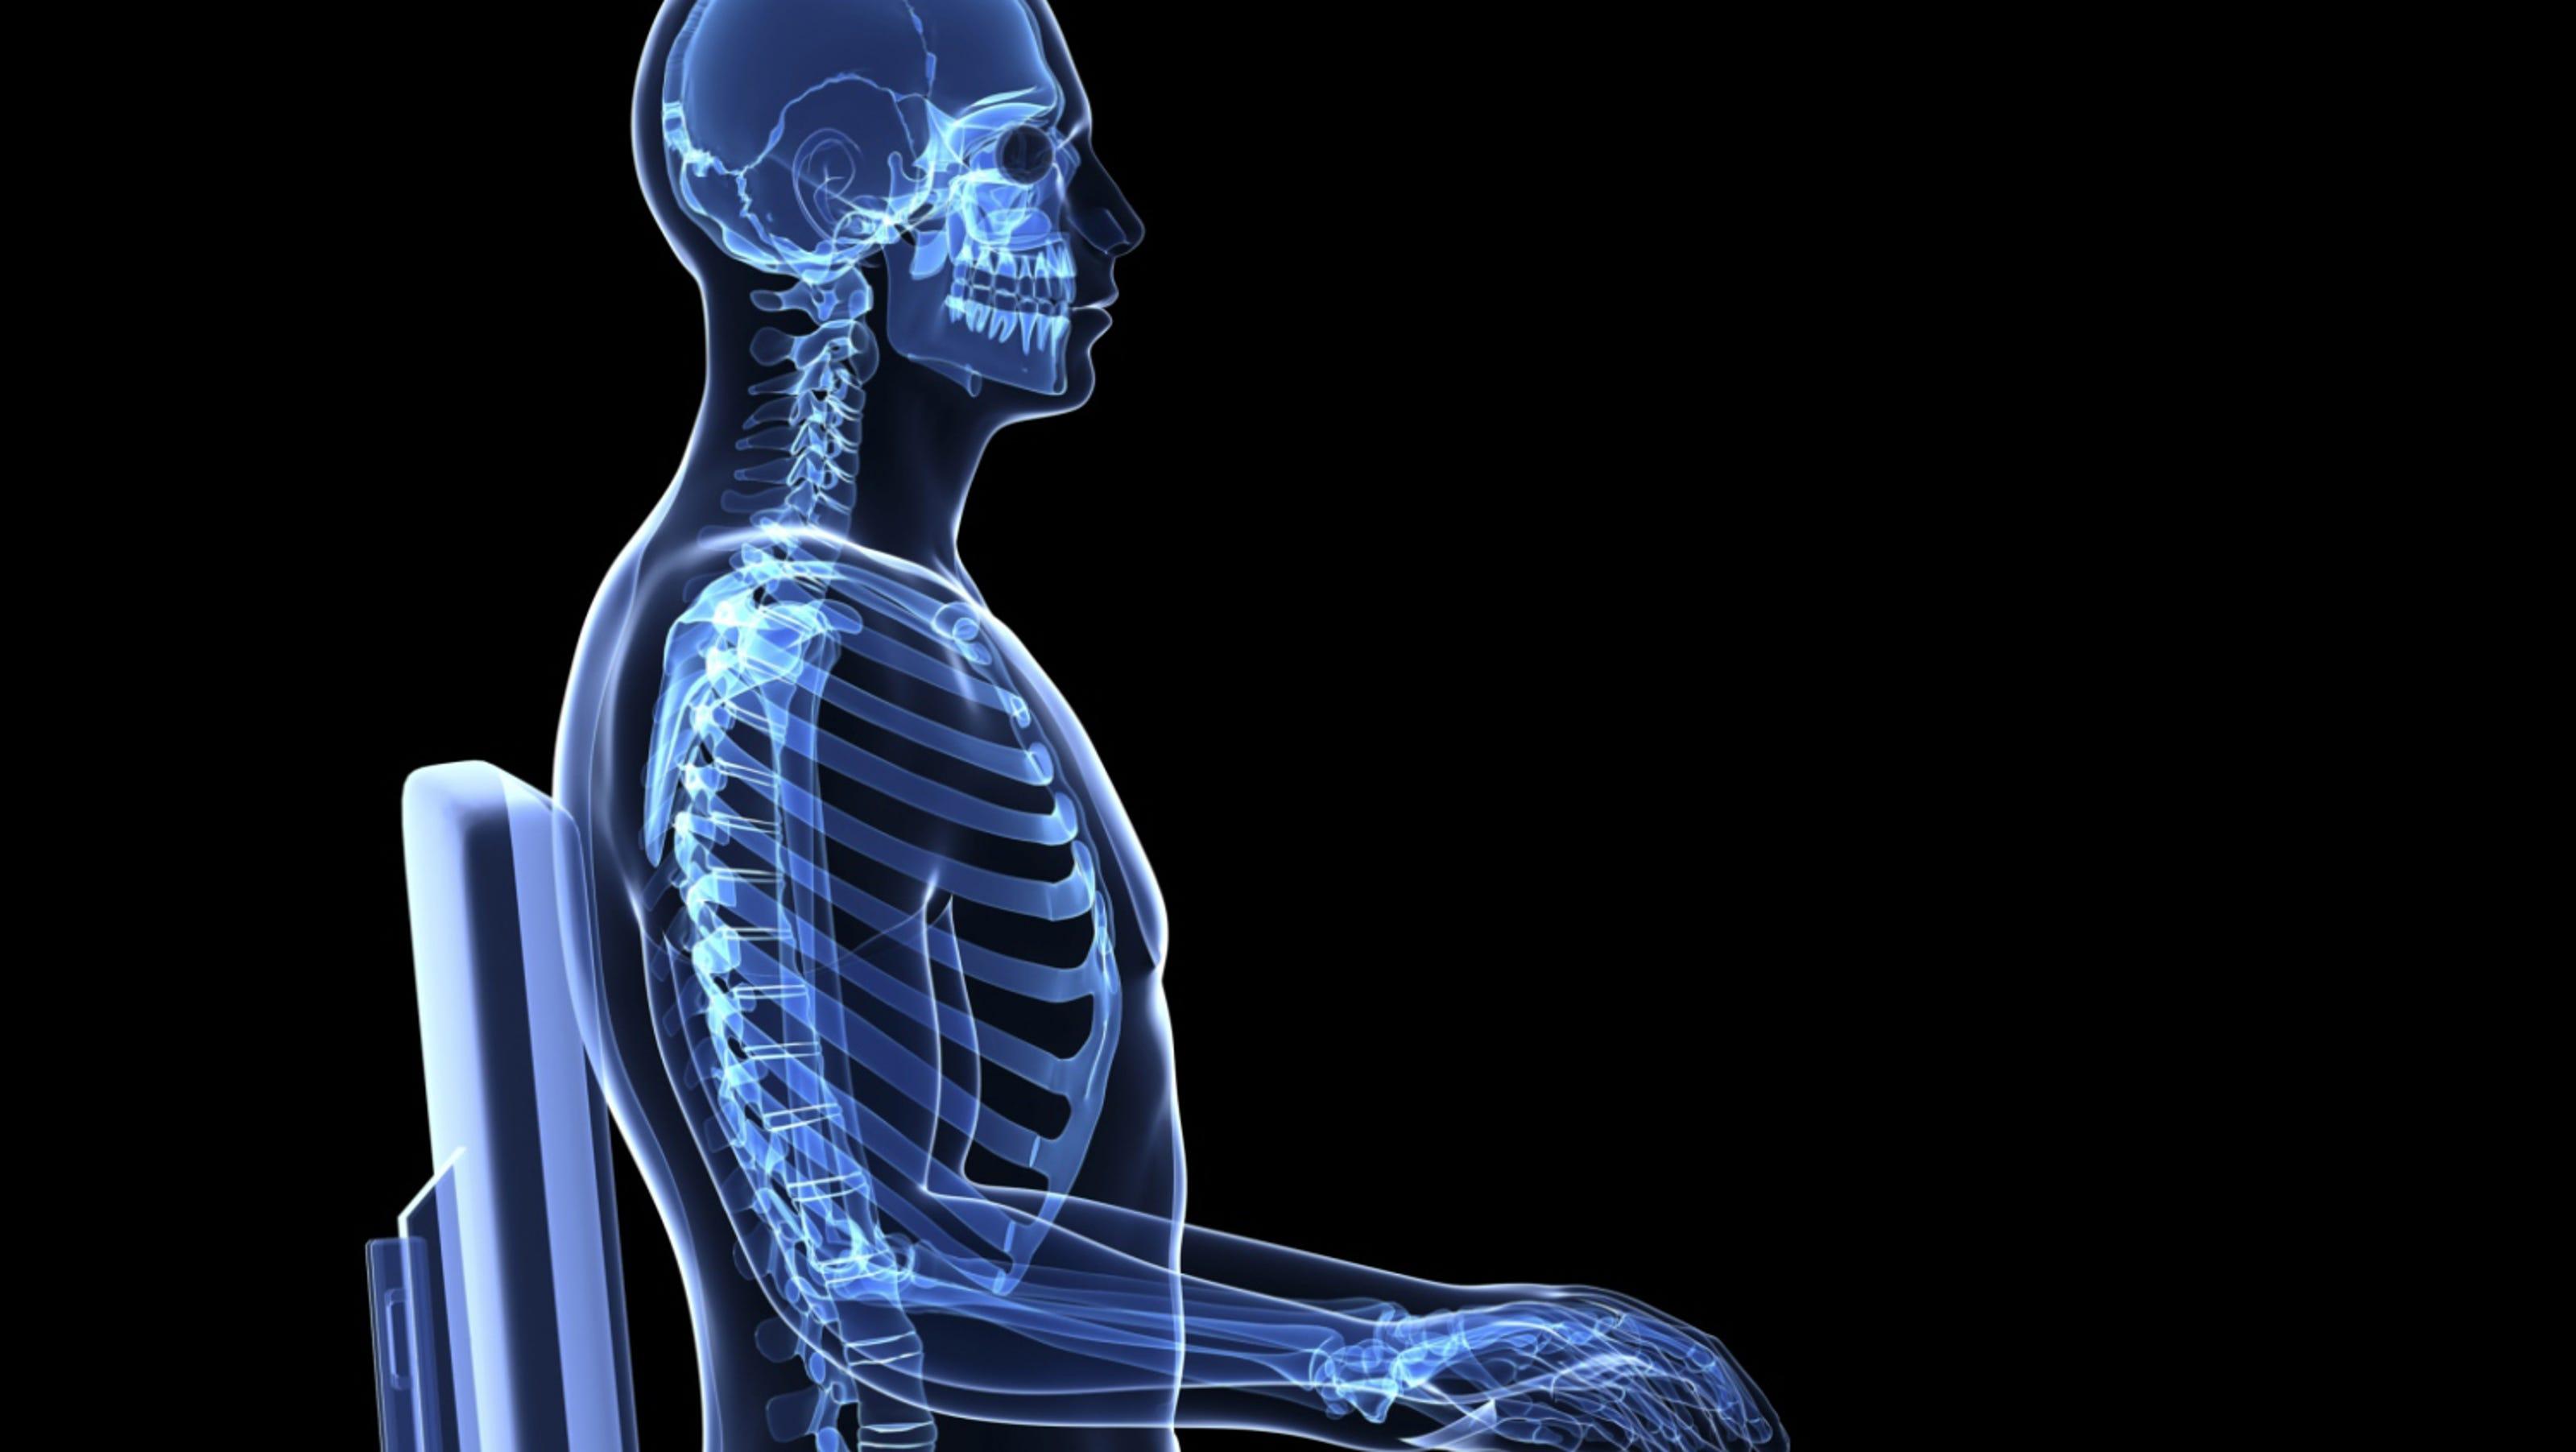 Skeletal Posture Pictures 52